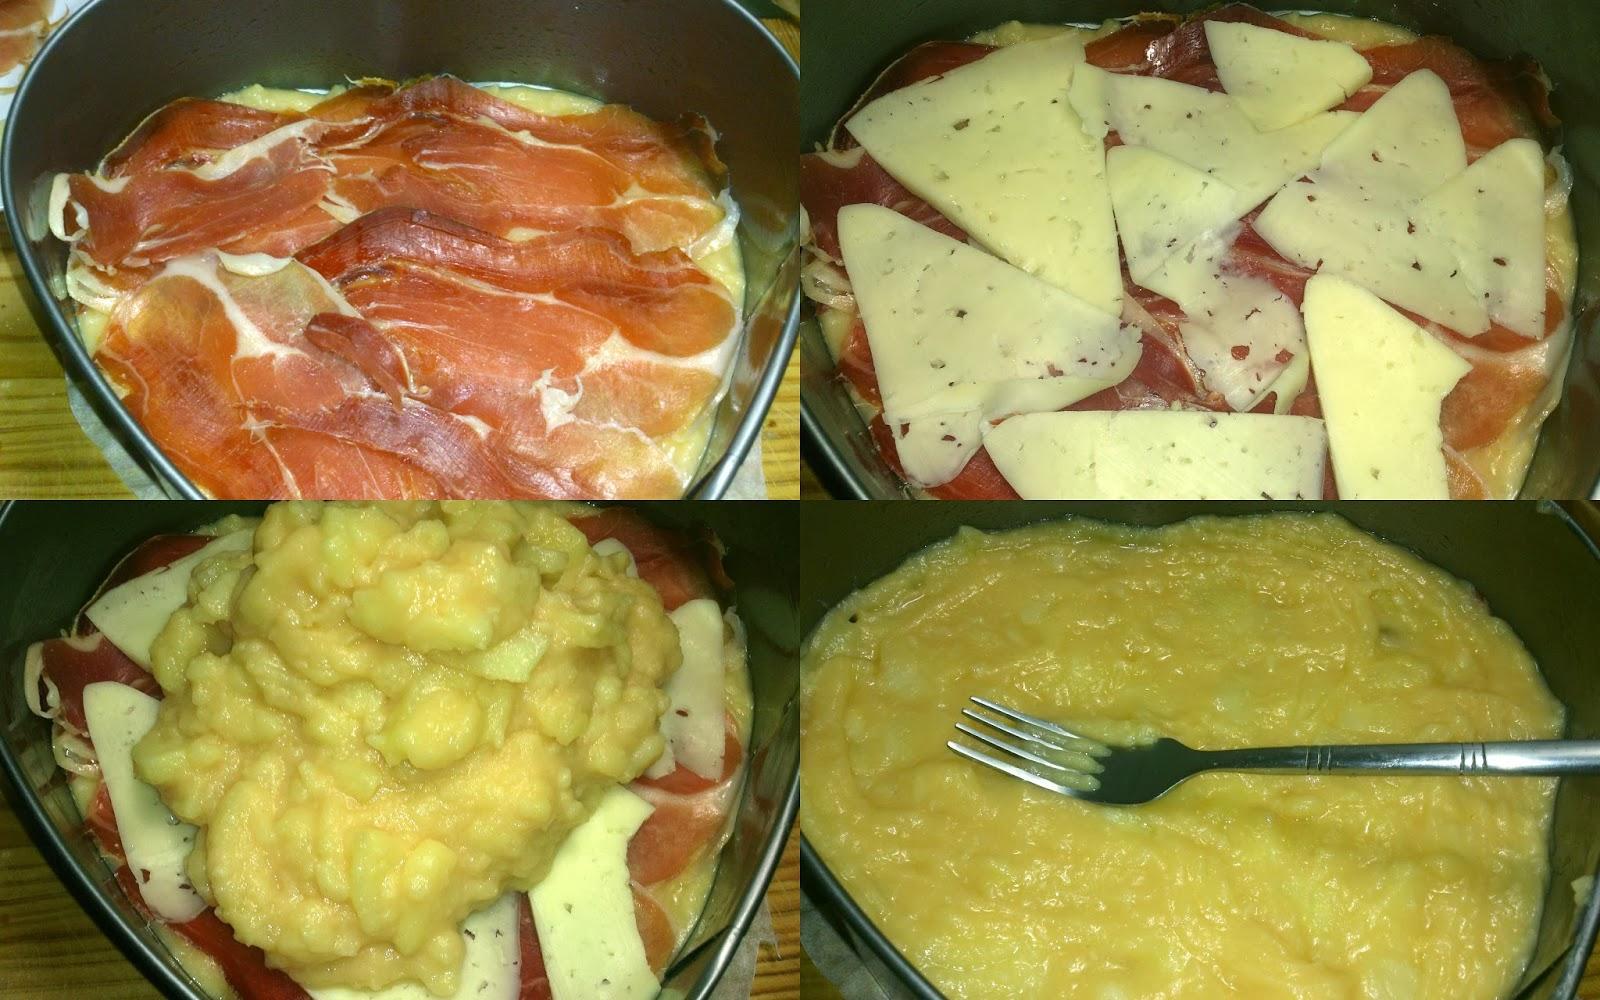 20 bonito cocinar tortilla de patatas fotos lazy blog - Lazy blog cocina ...